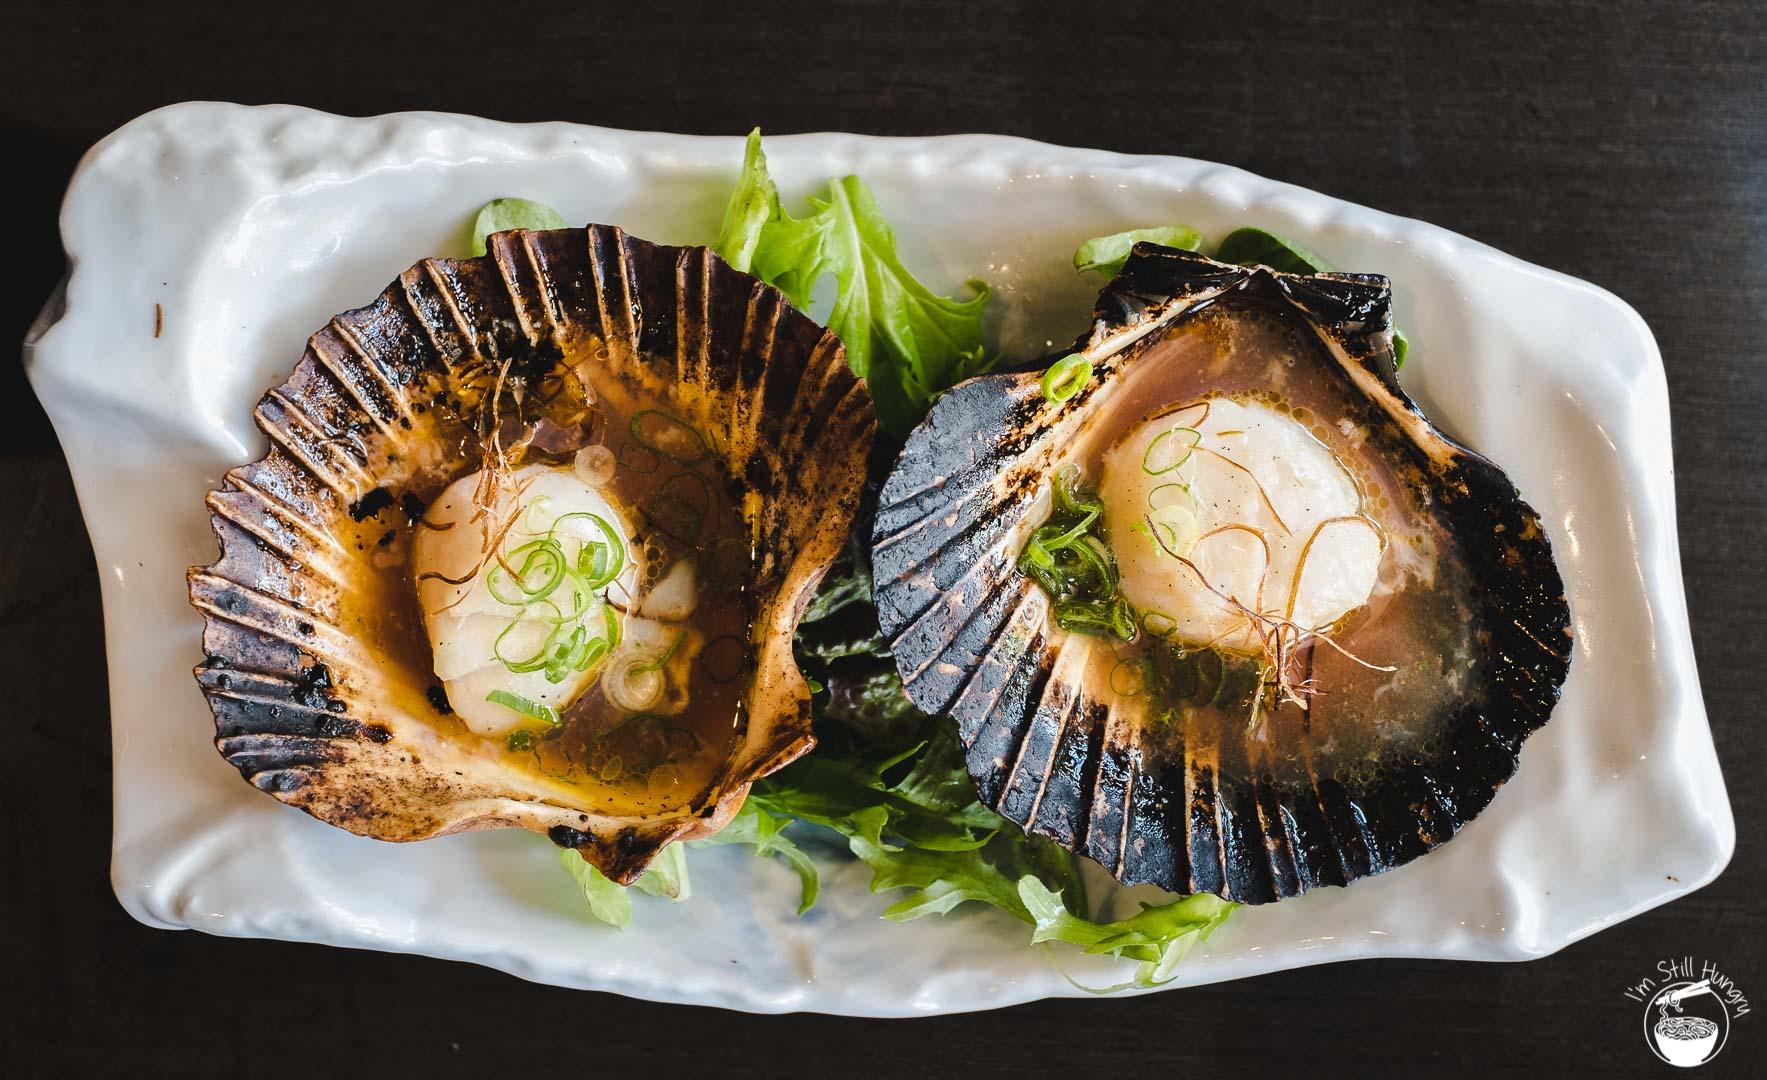 Toshiya Cremorne grilled scallops